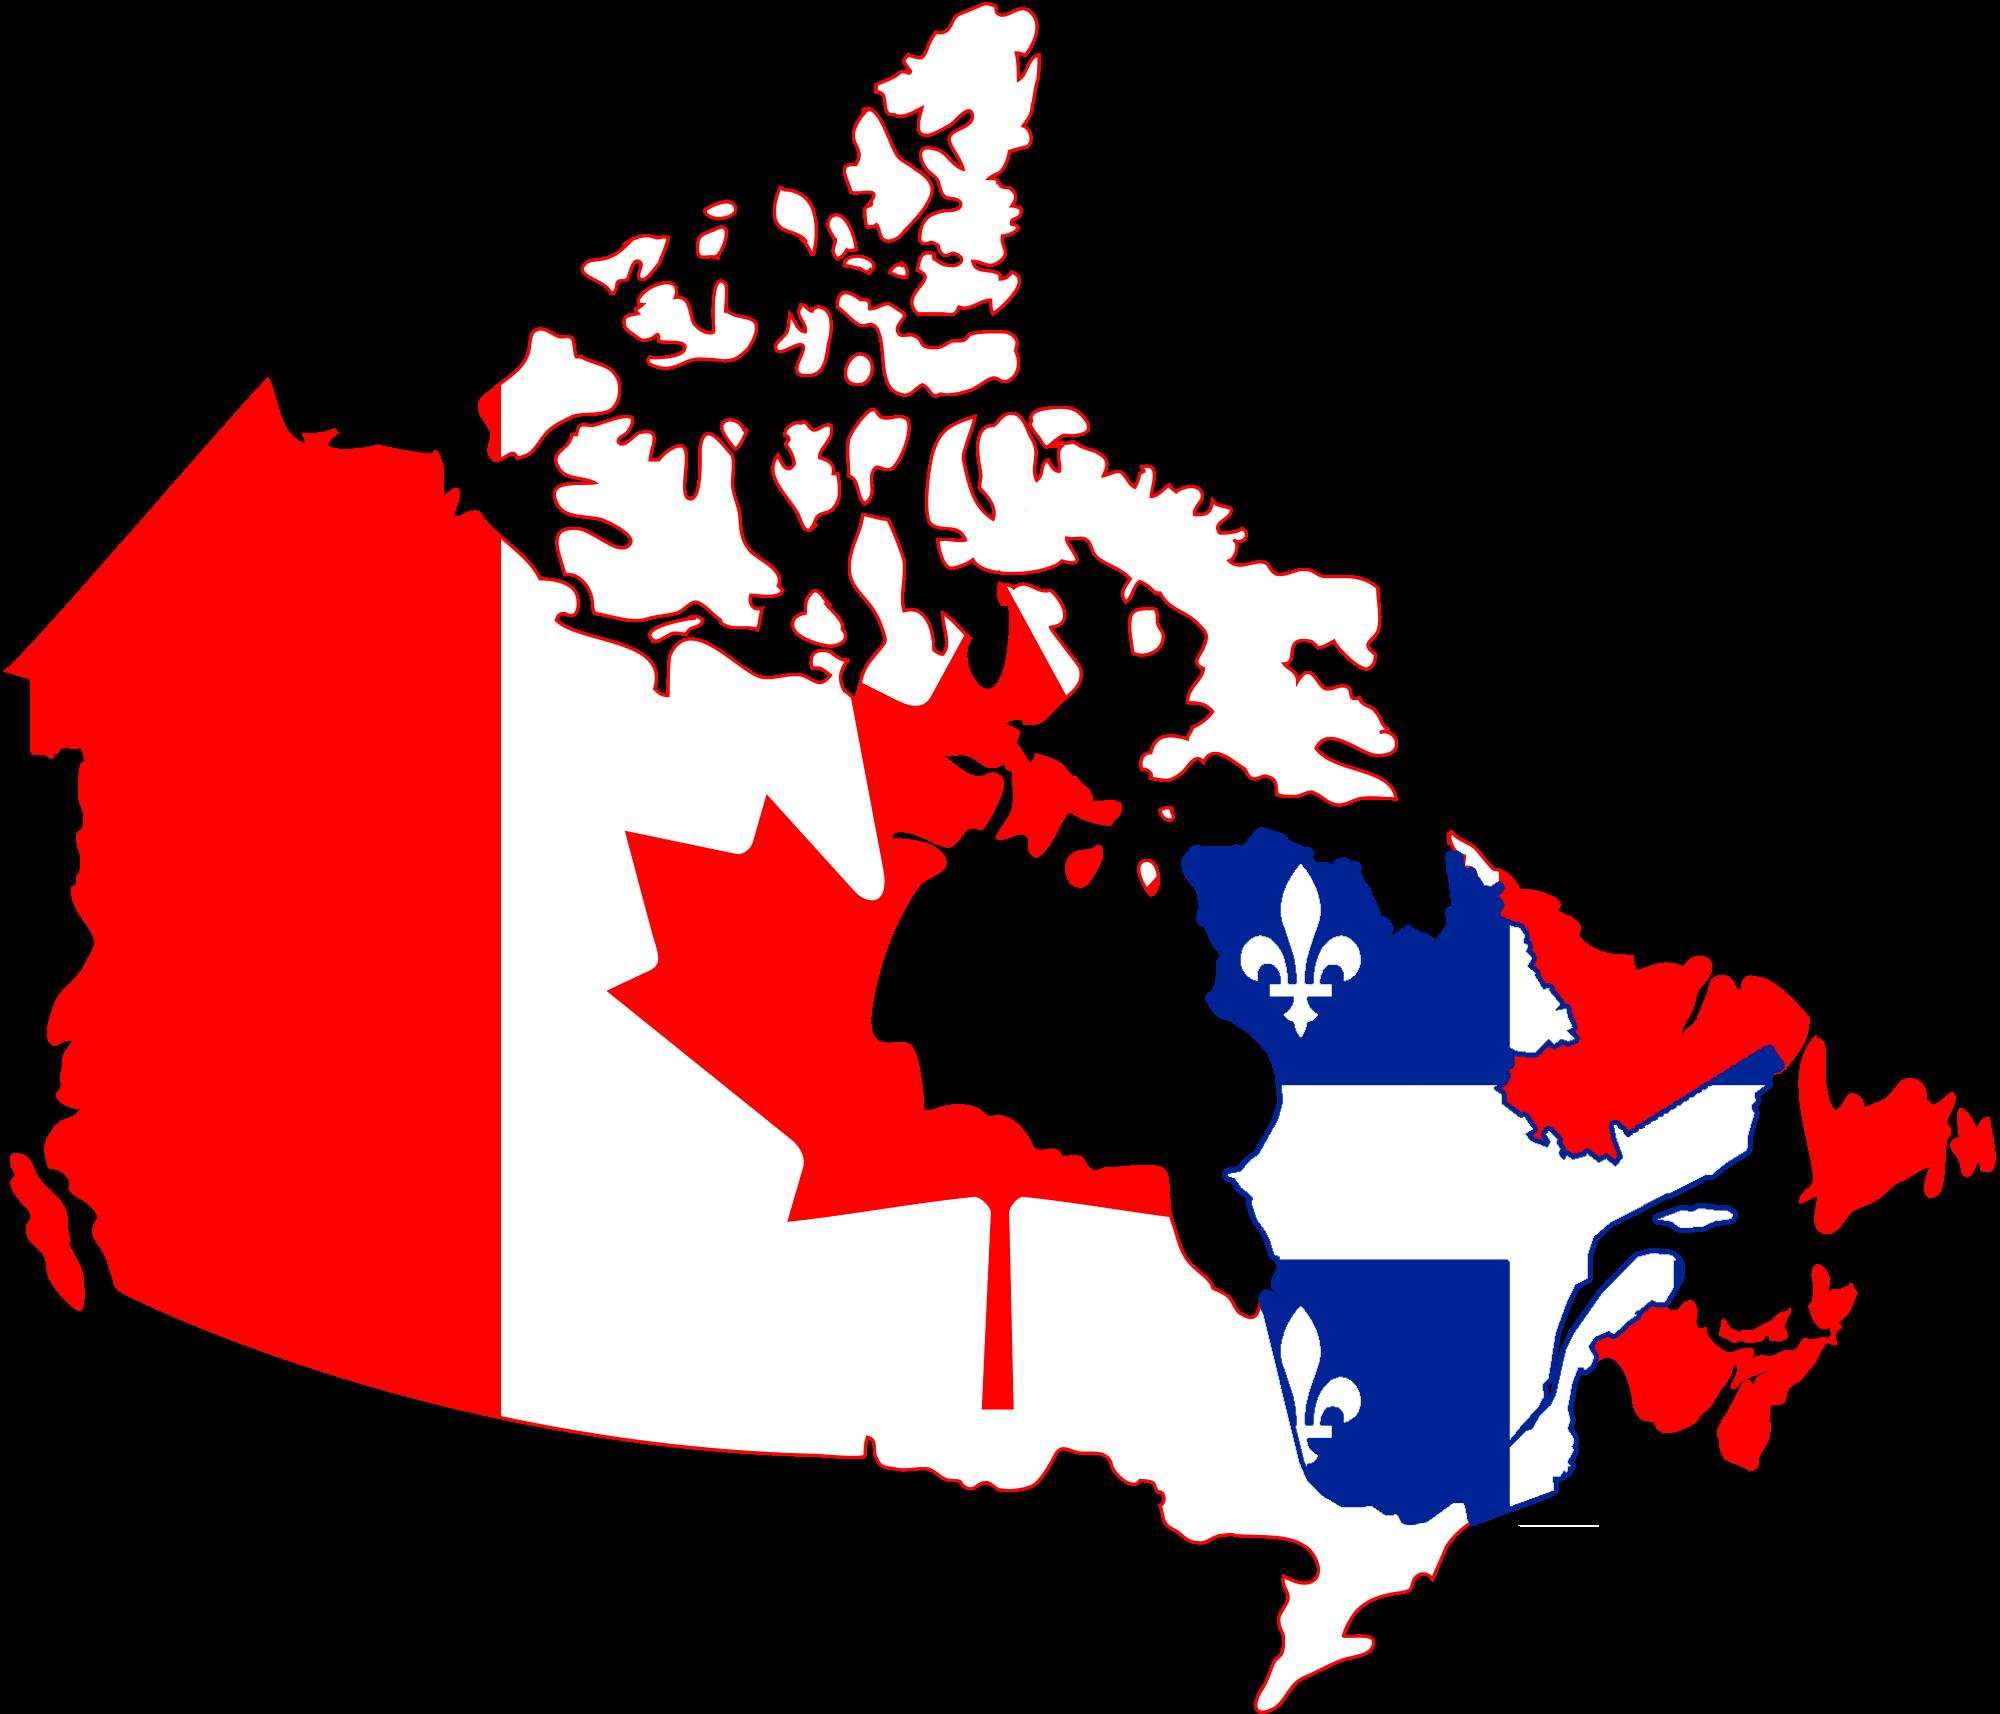 Quebec should not separate essays